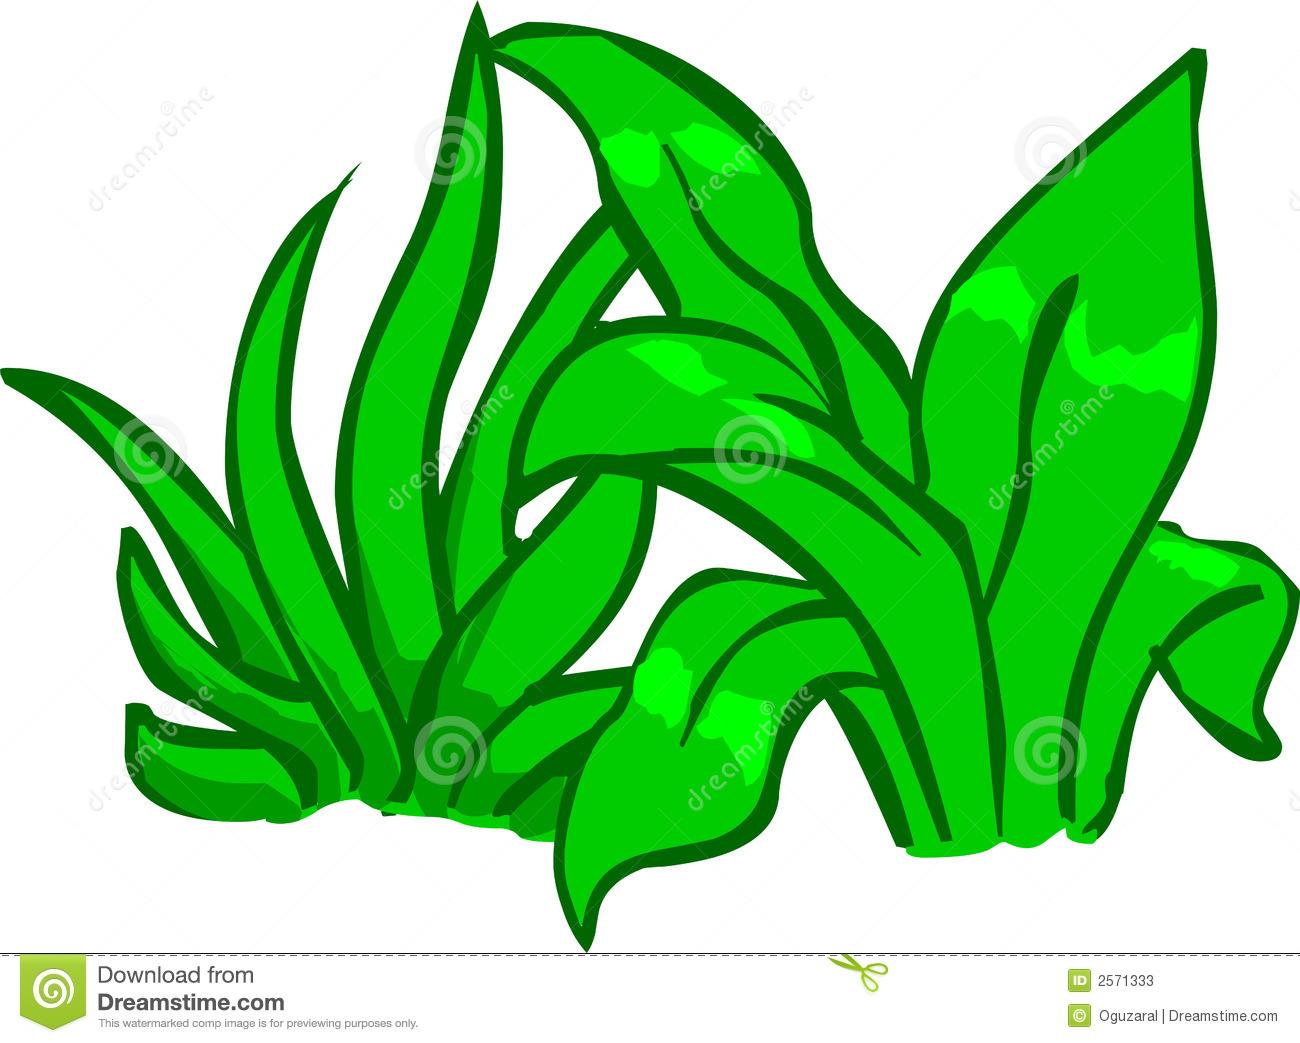 Cartoon plant group illustration. Bushes clipart animated